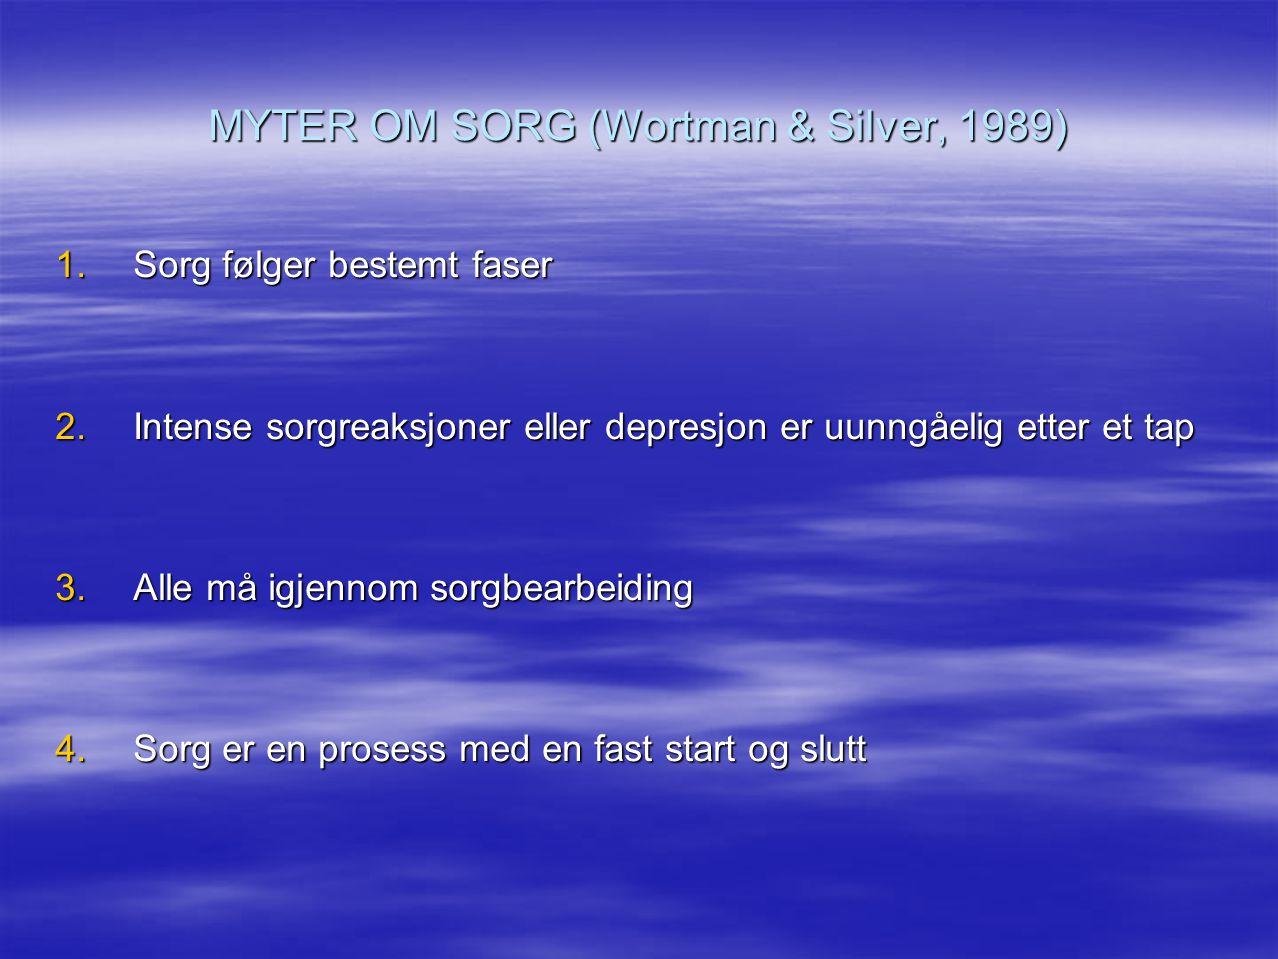 MYTER OM SORG (Wortman & Silver, 1989)